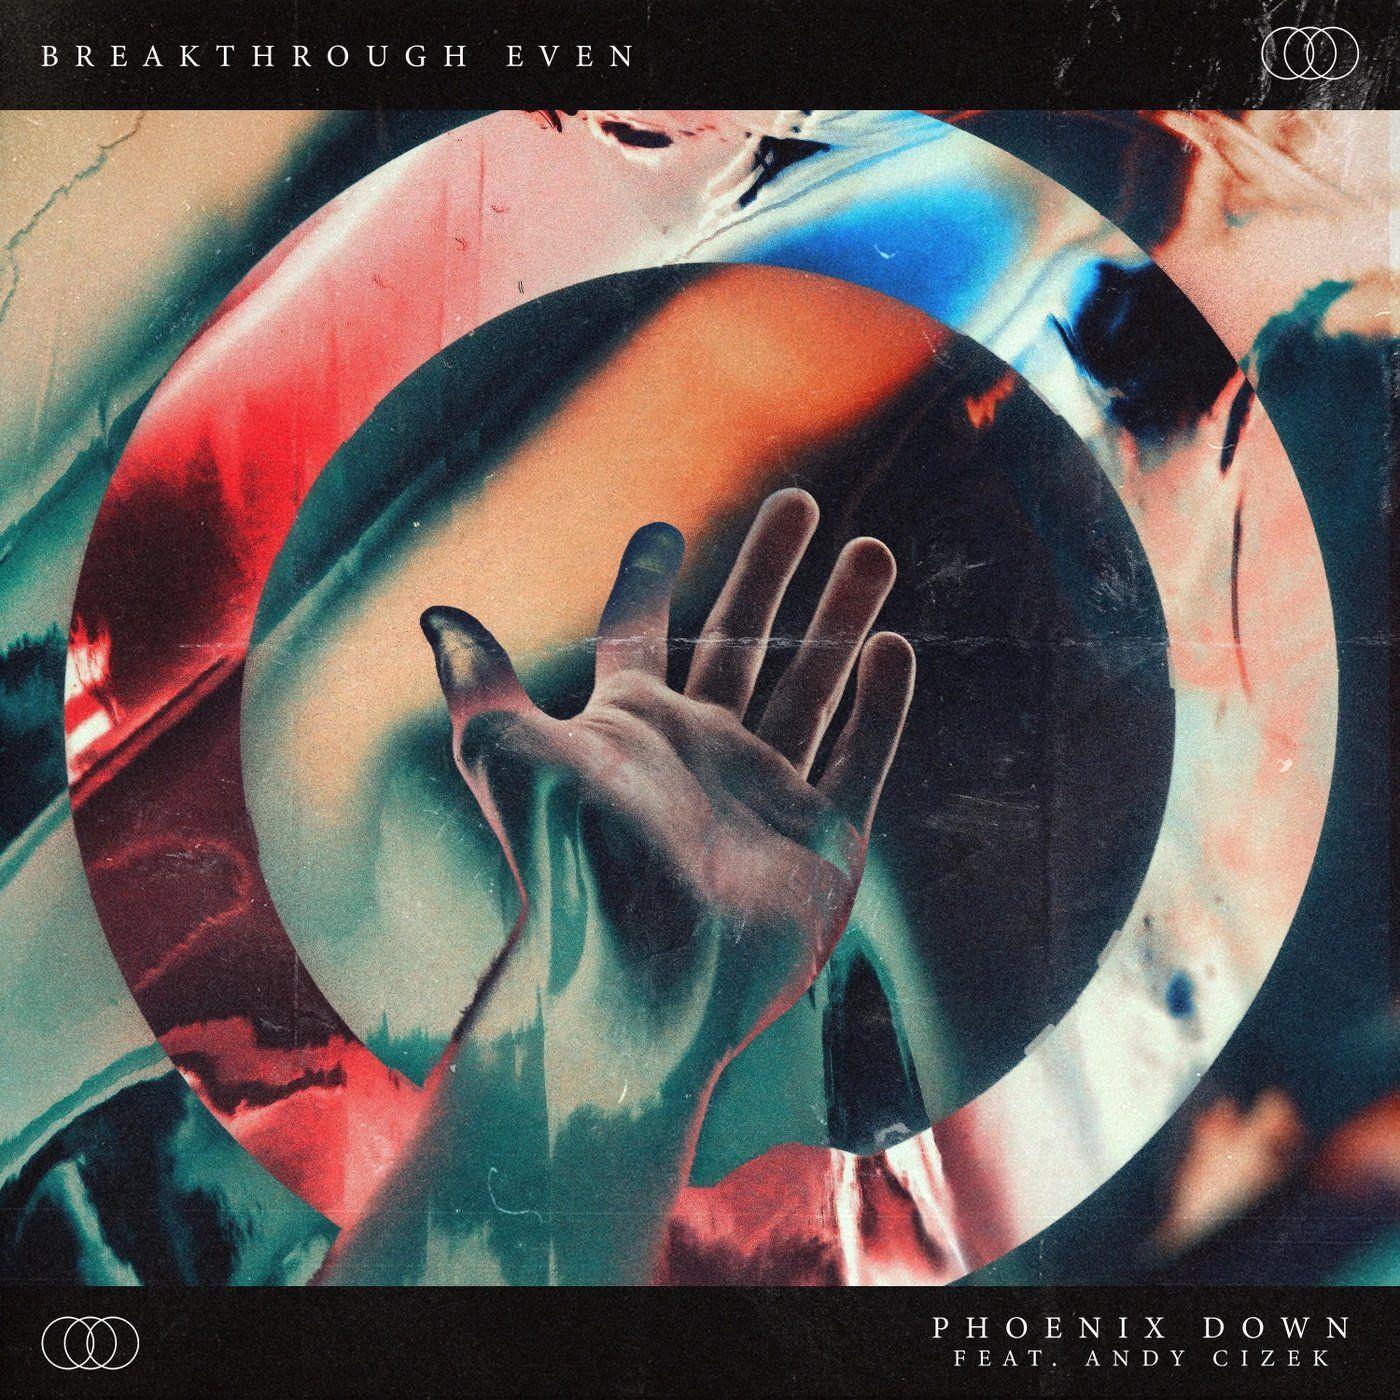 Breakthrough Even - Phoenix Down [single] (2021)